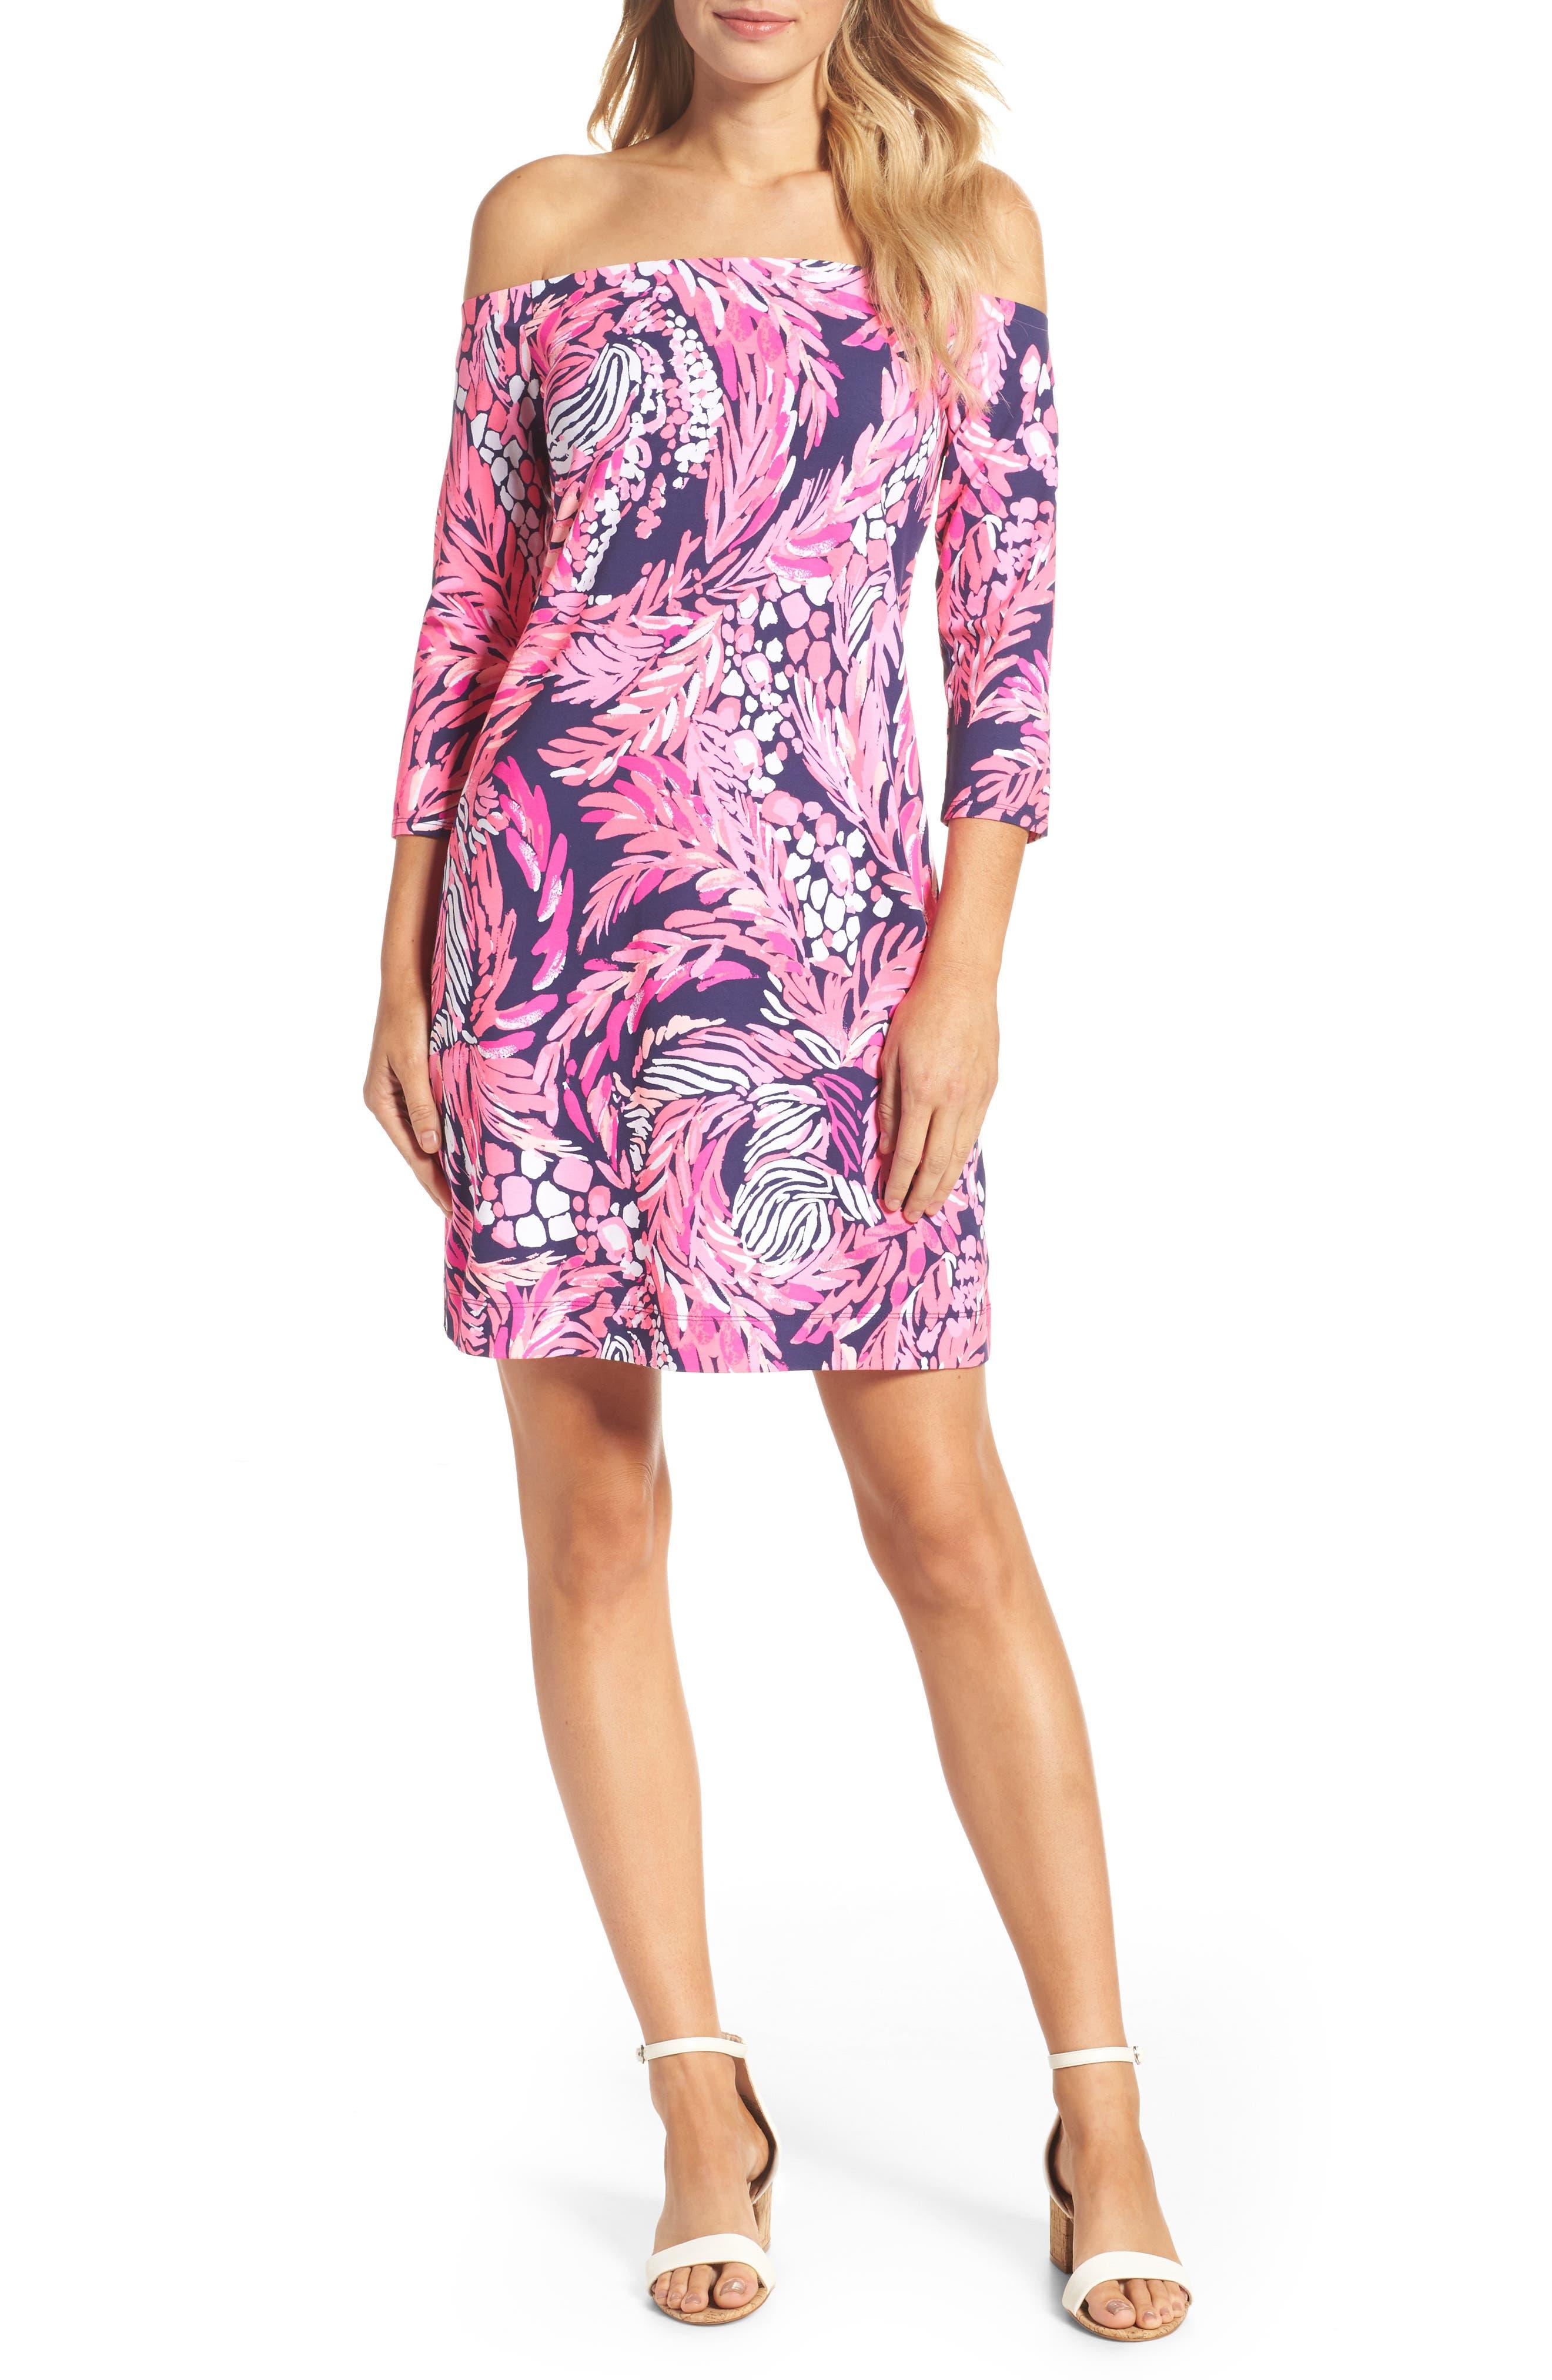 Main Image - Lilly Pulitzer® Laurana Off the Shoulder Sheath Dress